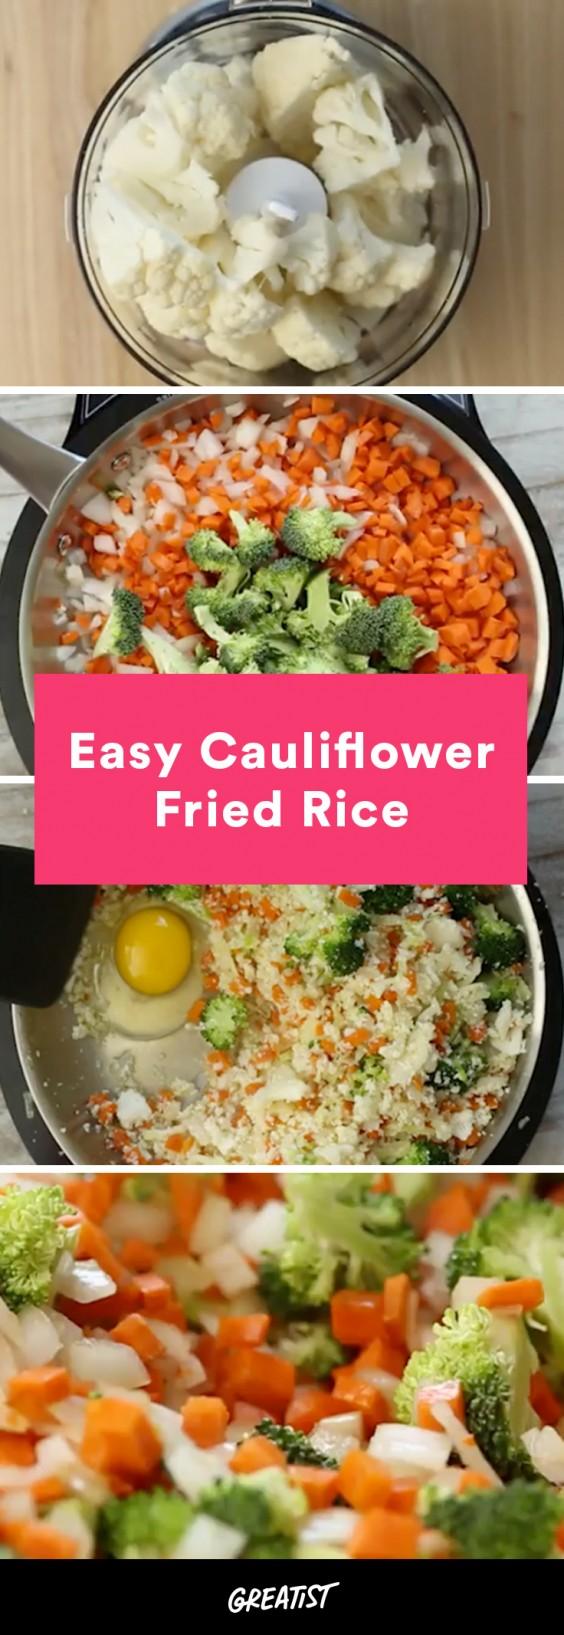 video: cauliflower fried rice